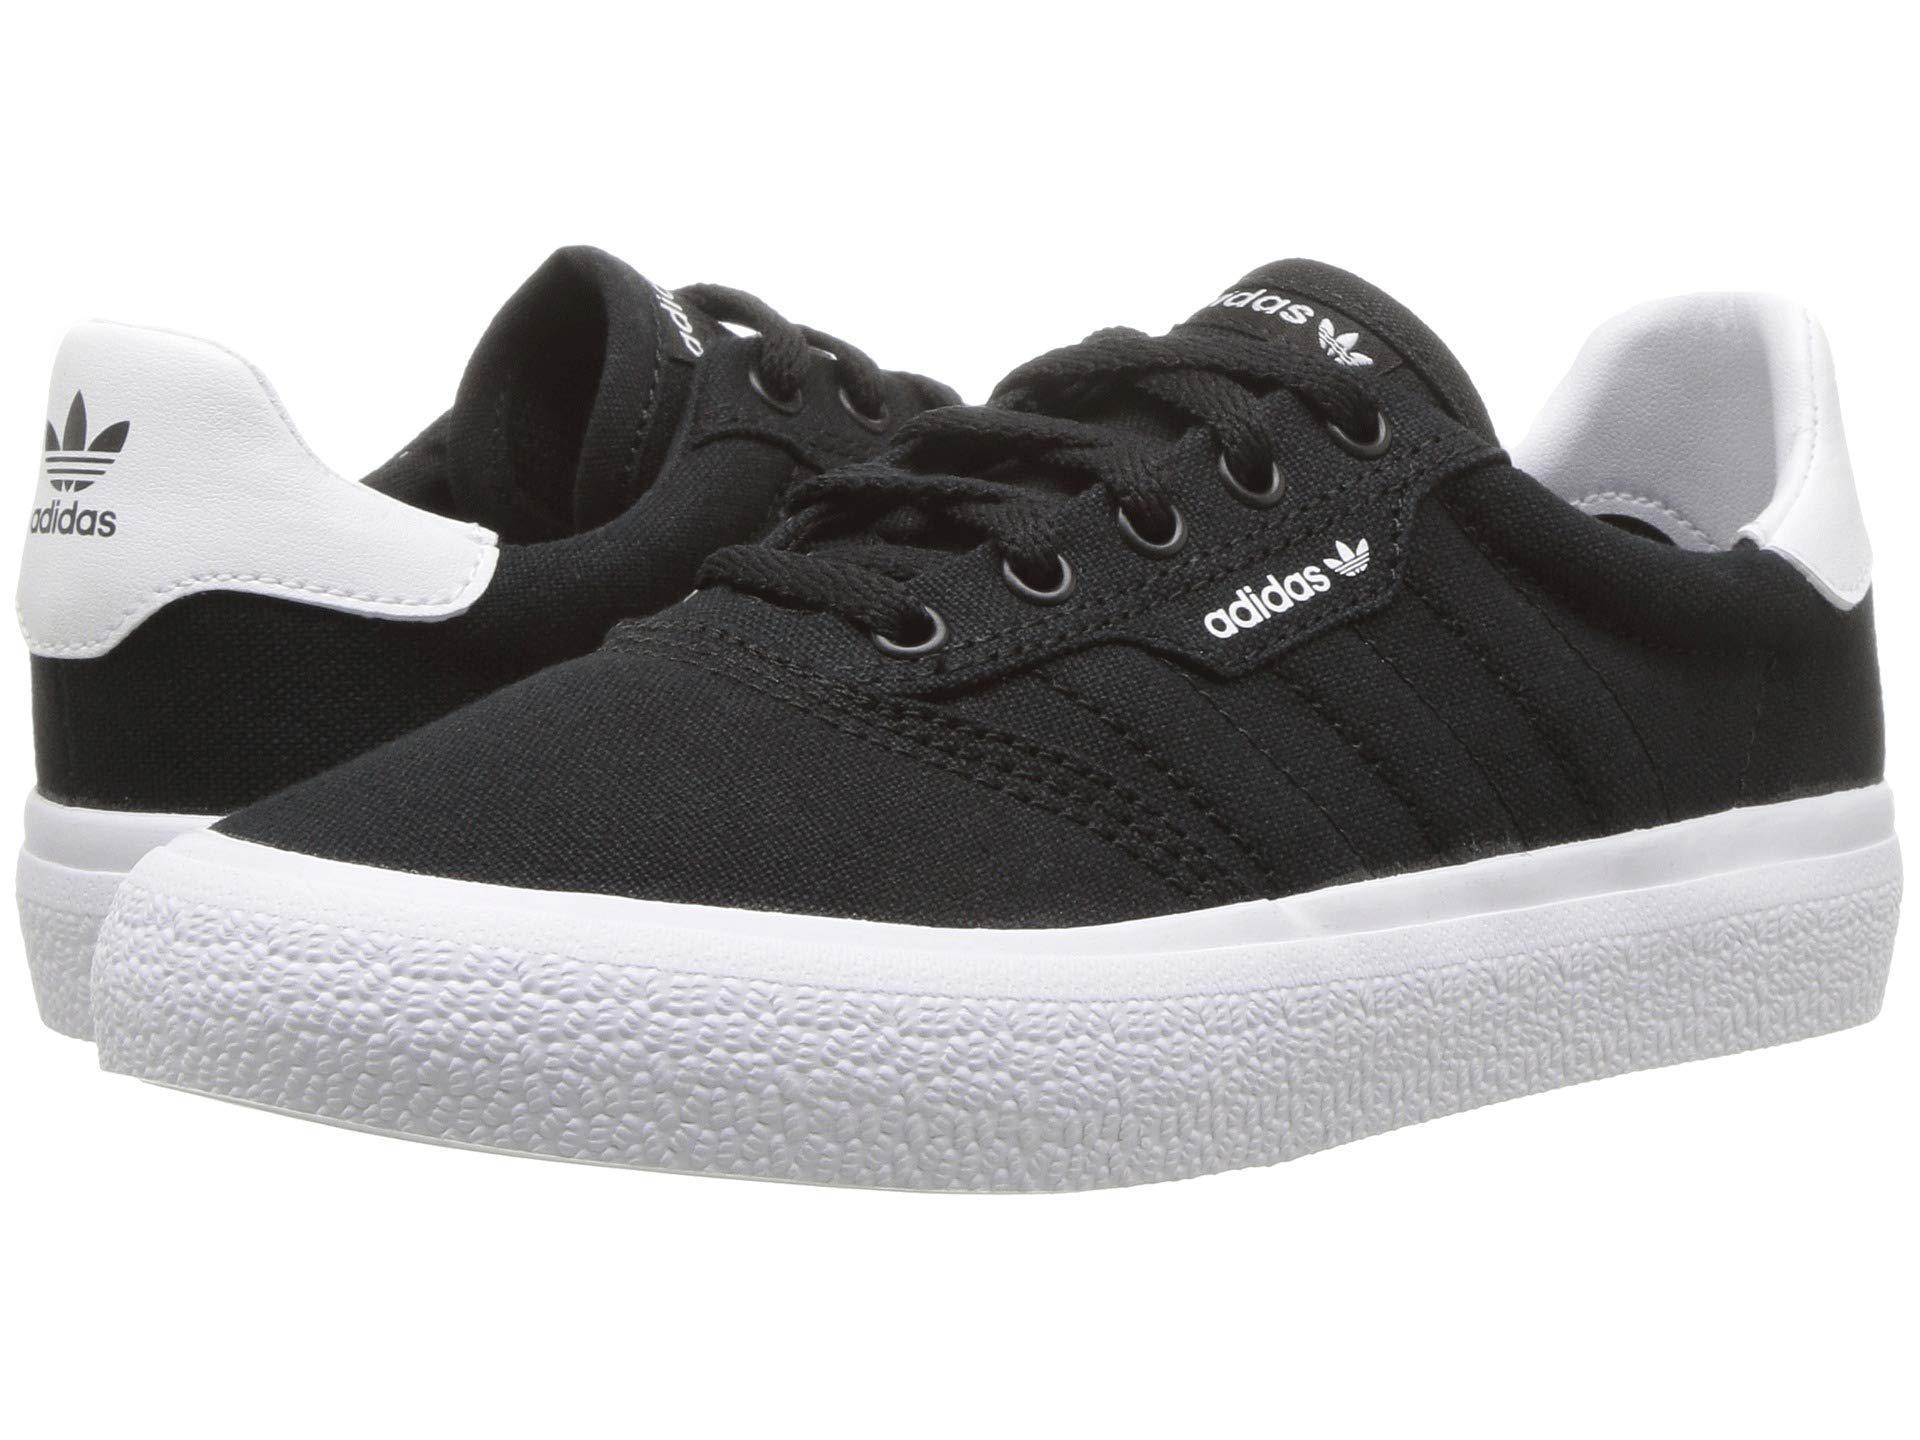 core Originals J Adidas White Blackfootwear 3mc Lyst Blackcore w6RSxaqnC